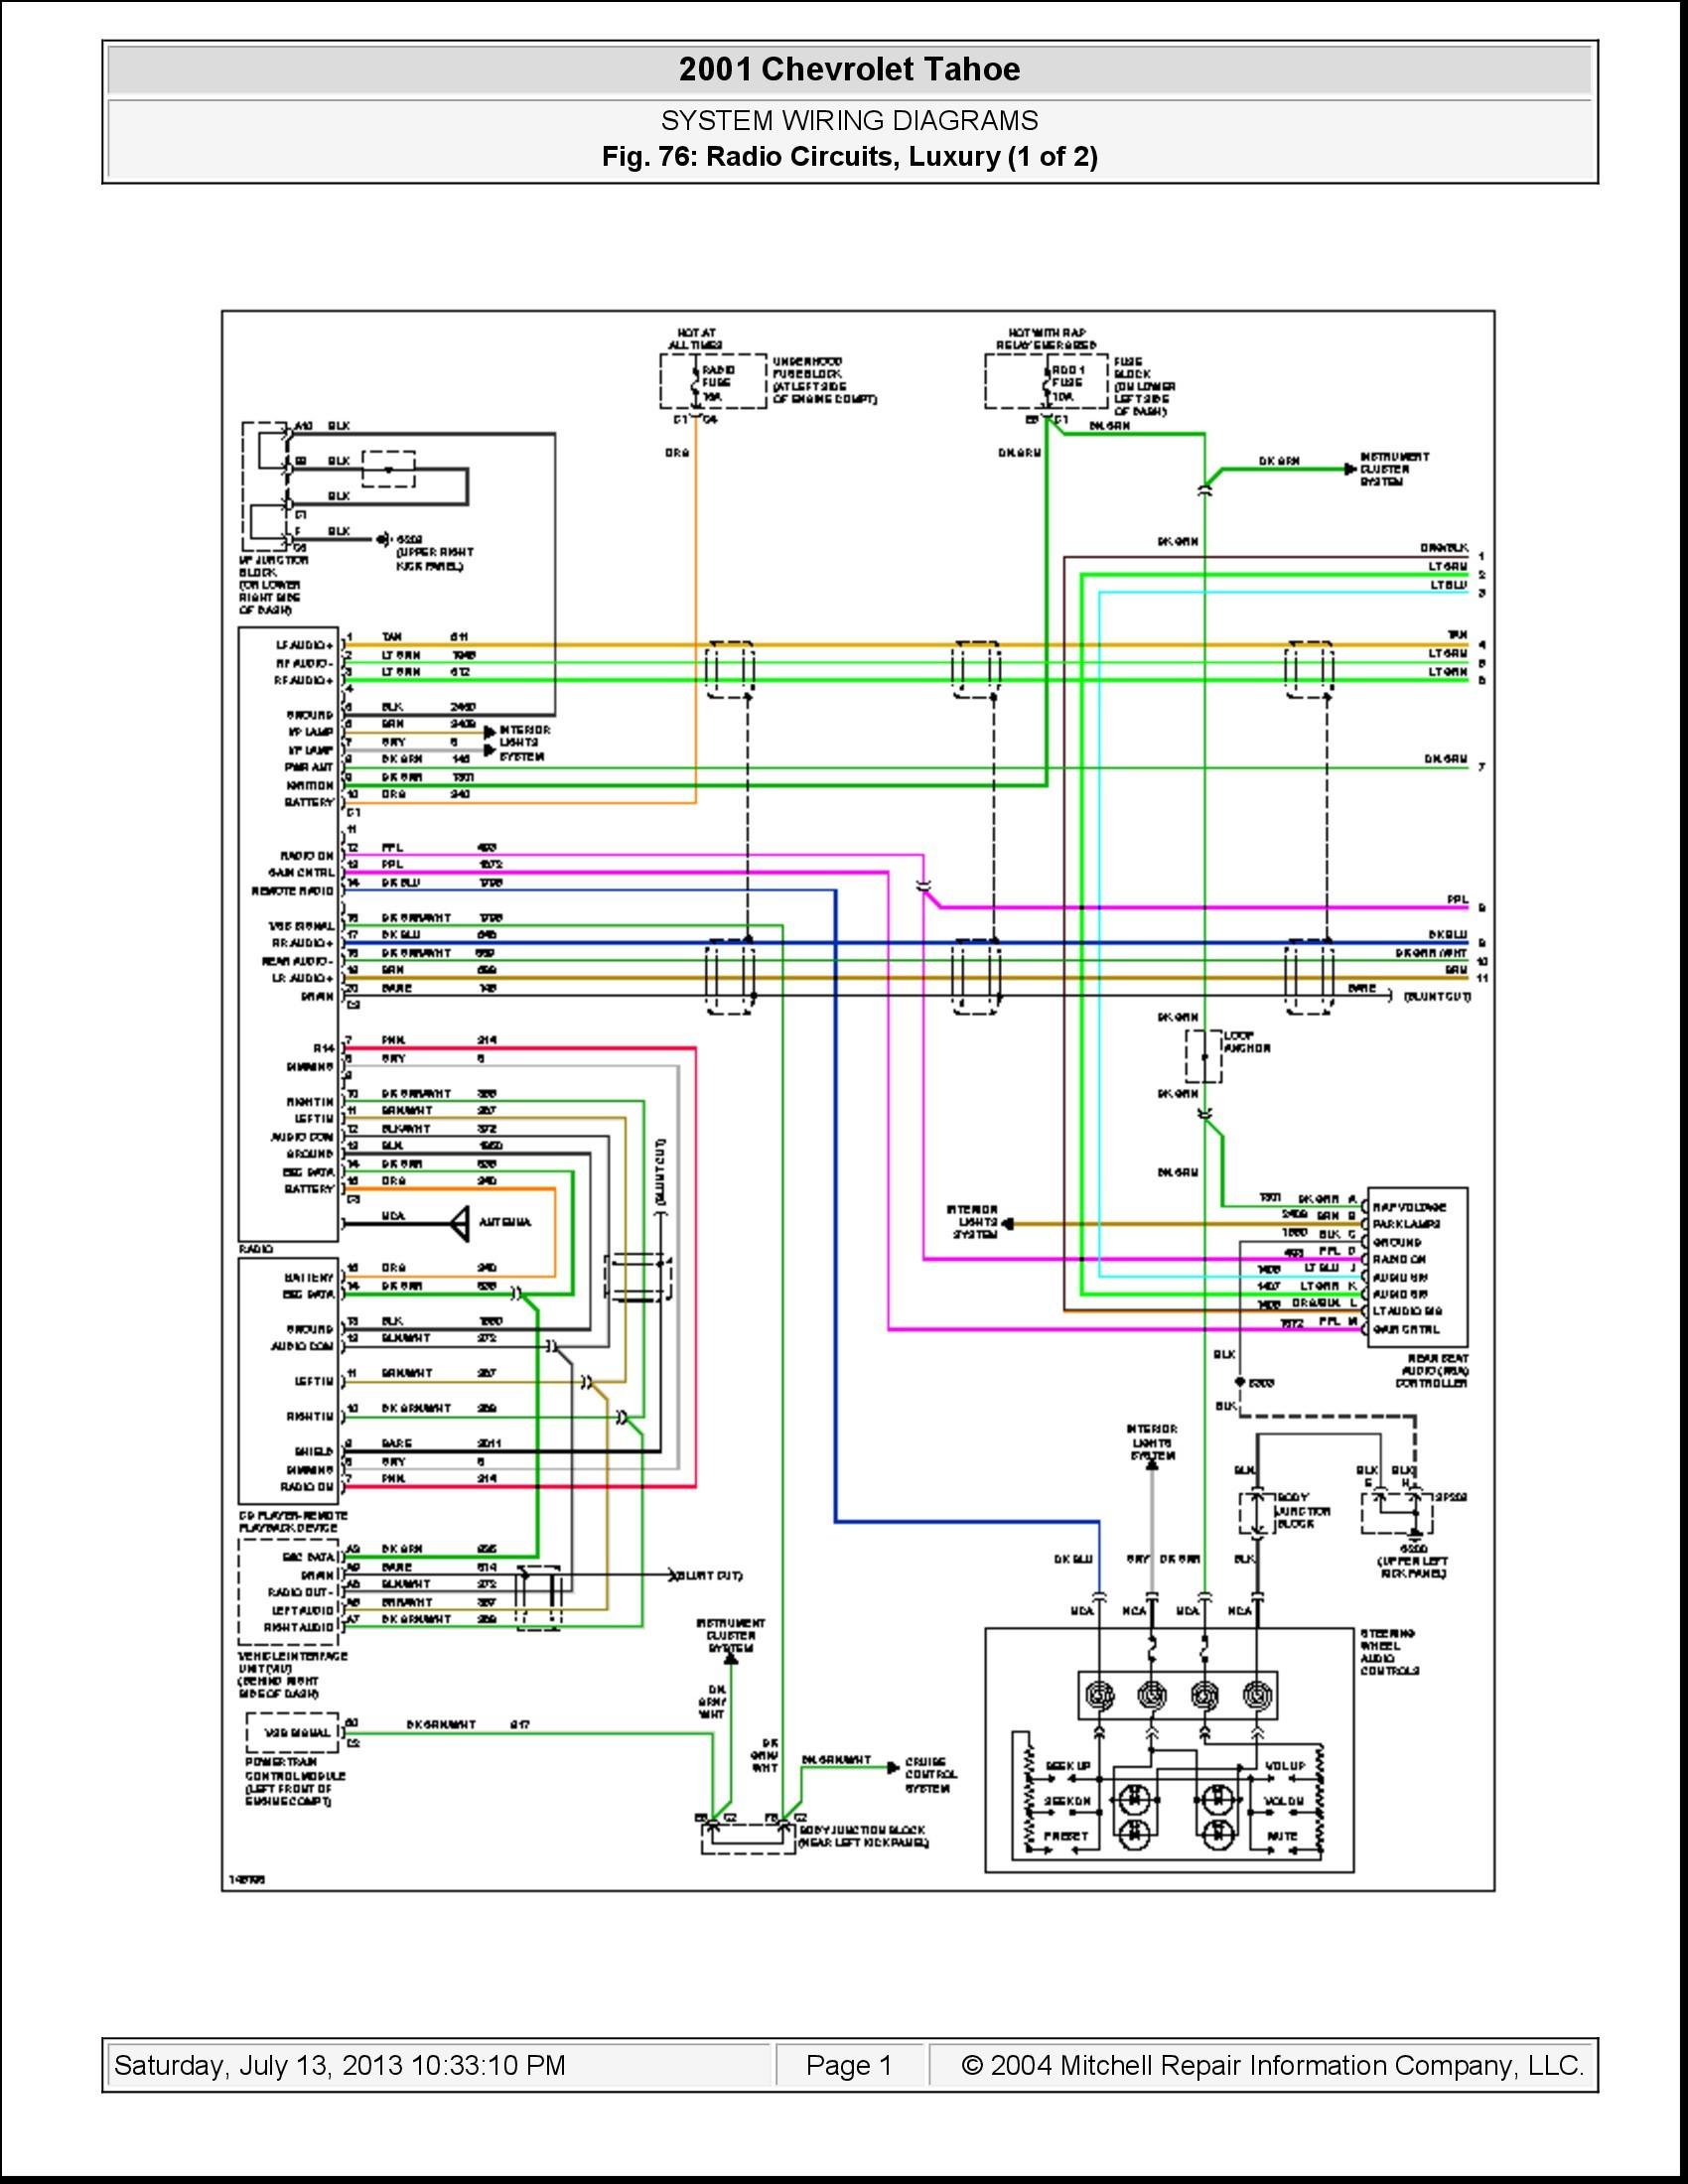 99 Dodge Ram 1500 Radio Wiring Diagram | Hncdesignperu - 1999 Dodge Ram 1500 Radio Wiring Diagram